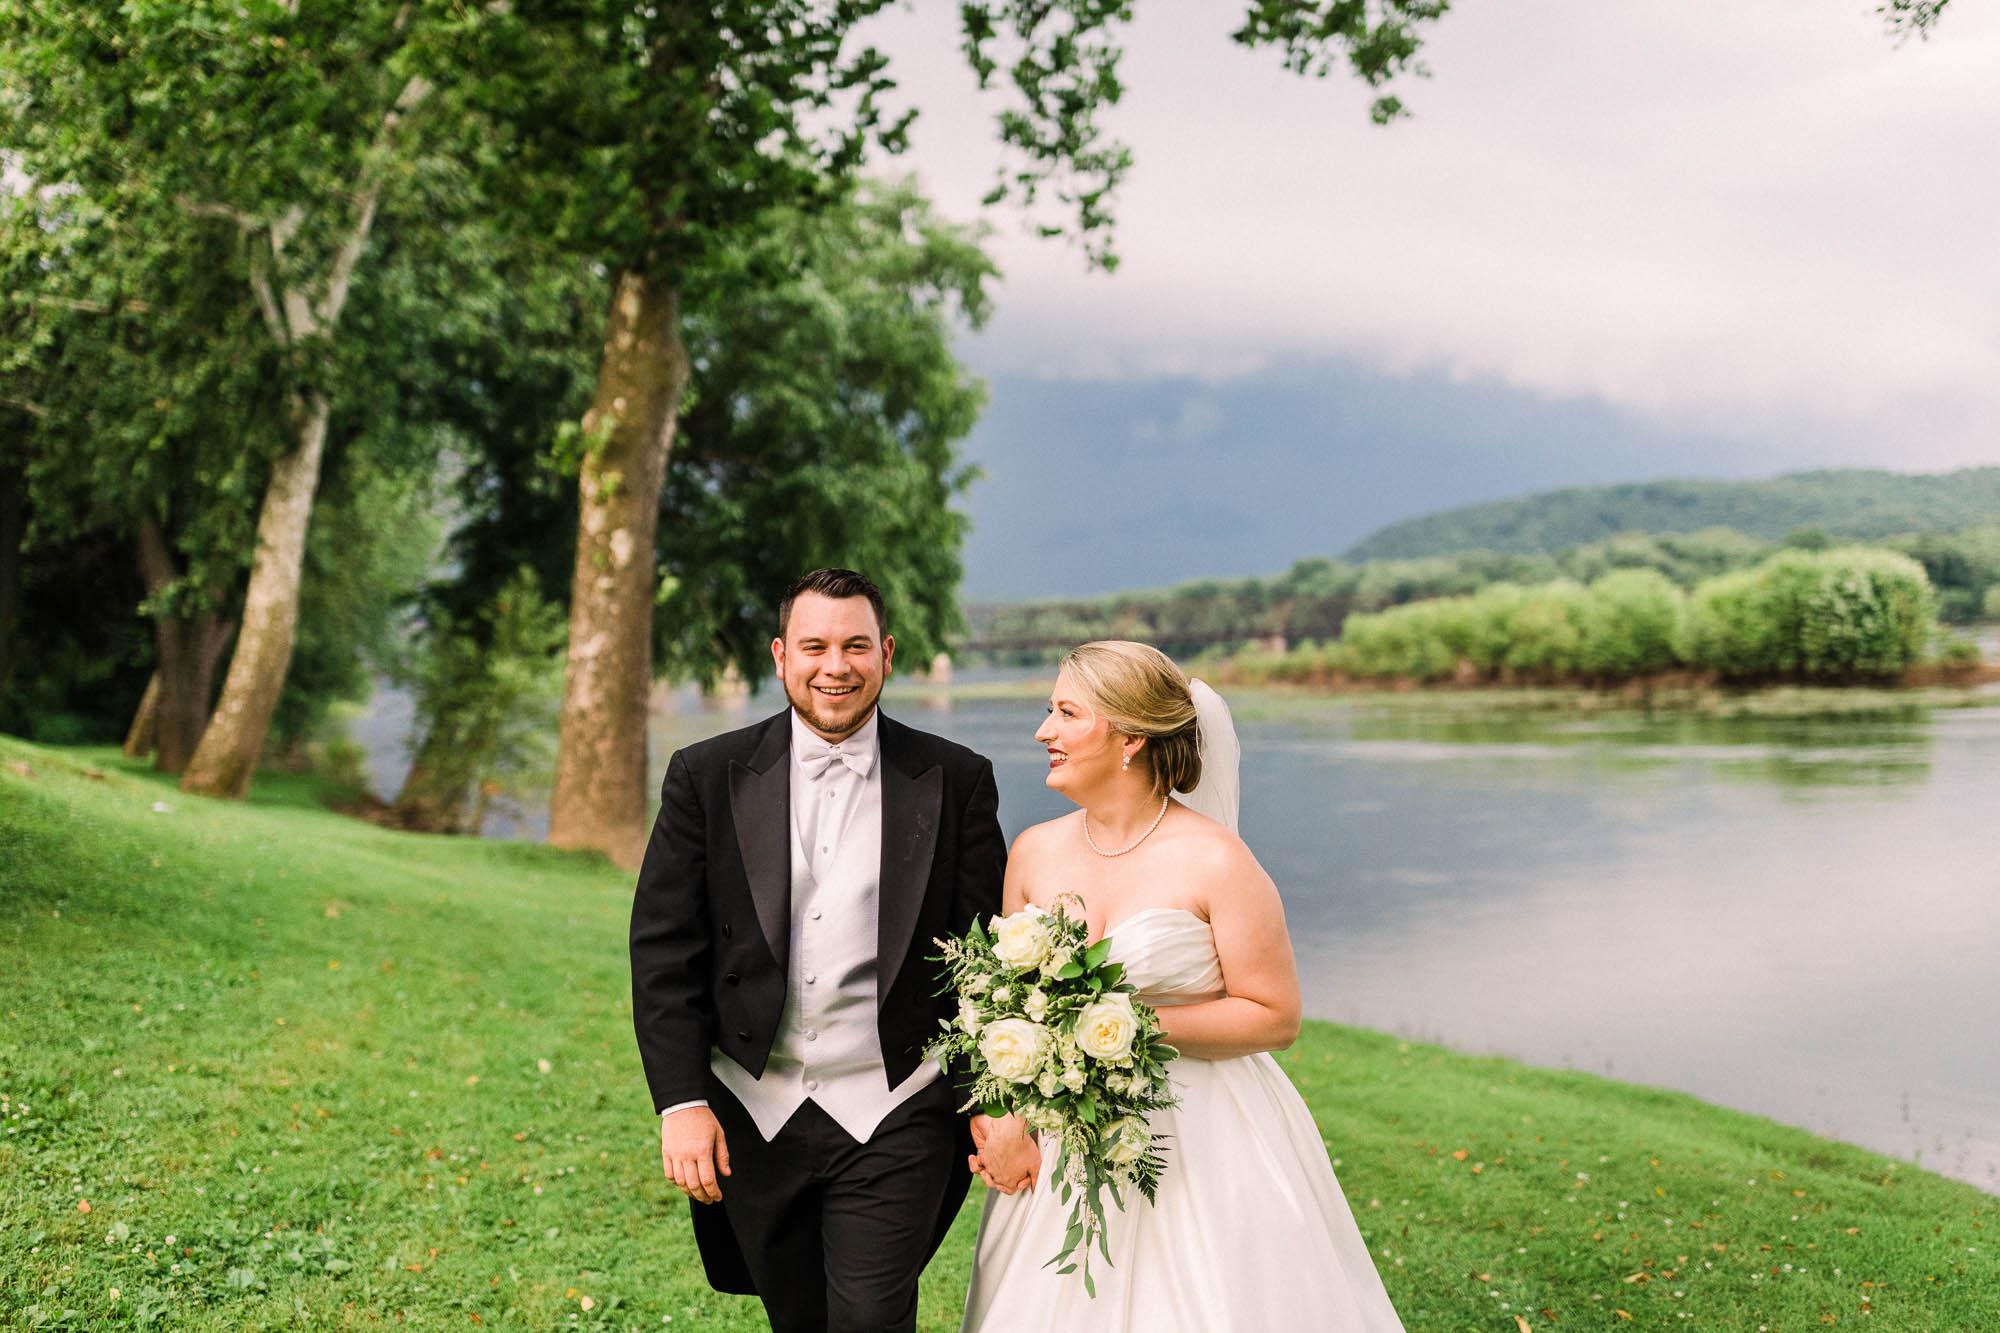 isle-of-que-wedding-6949.jpg